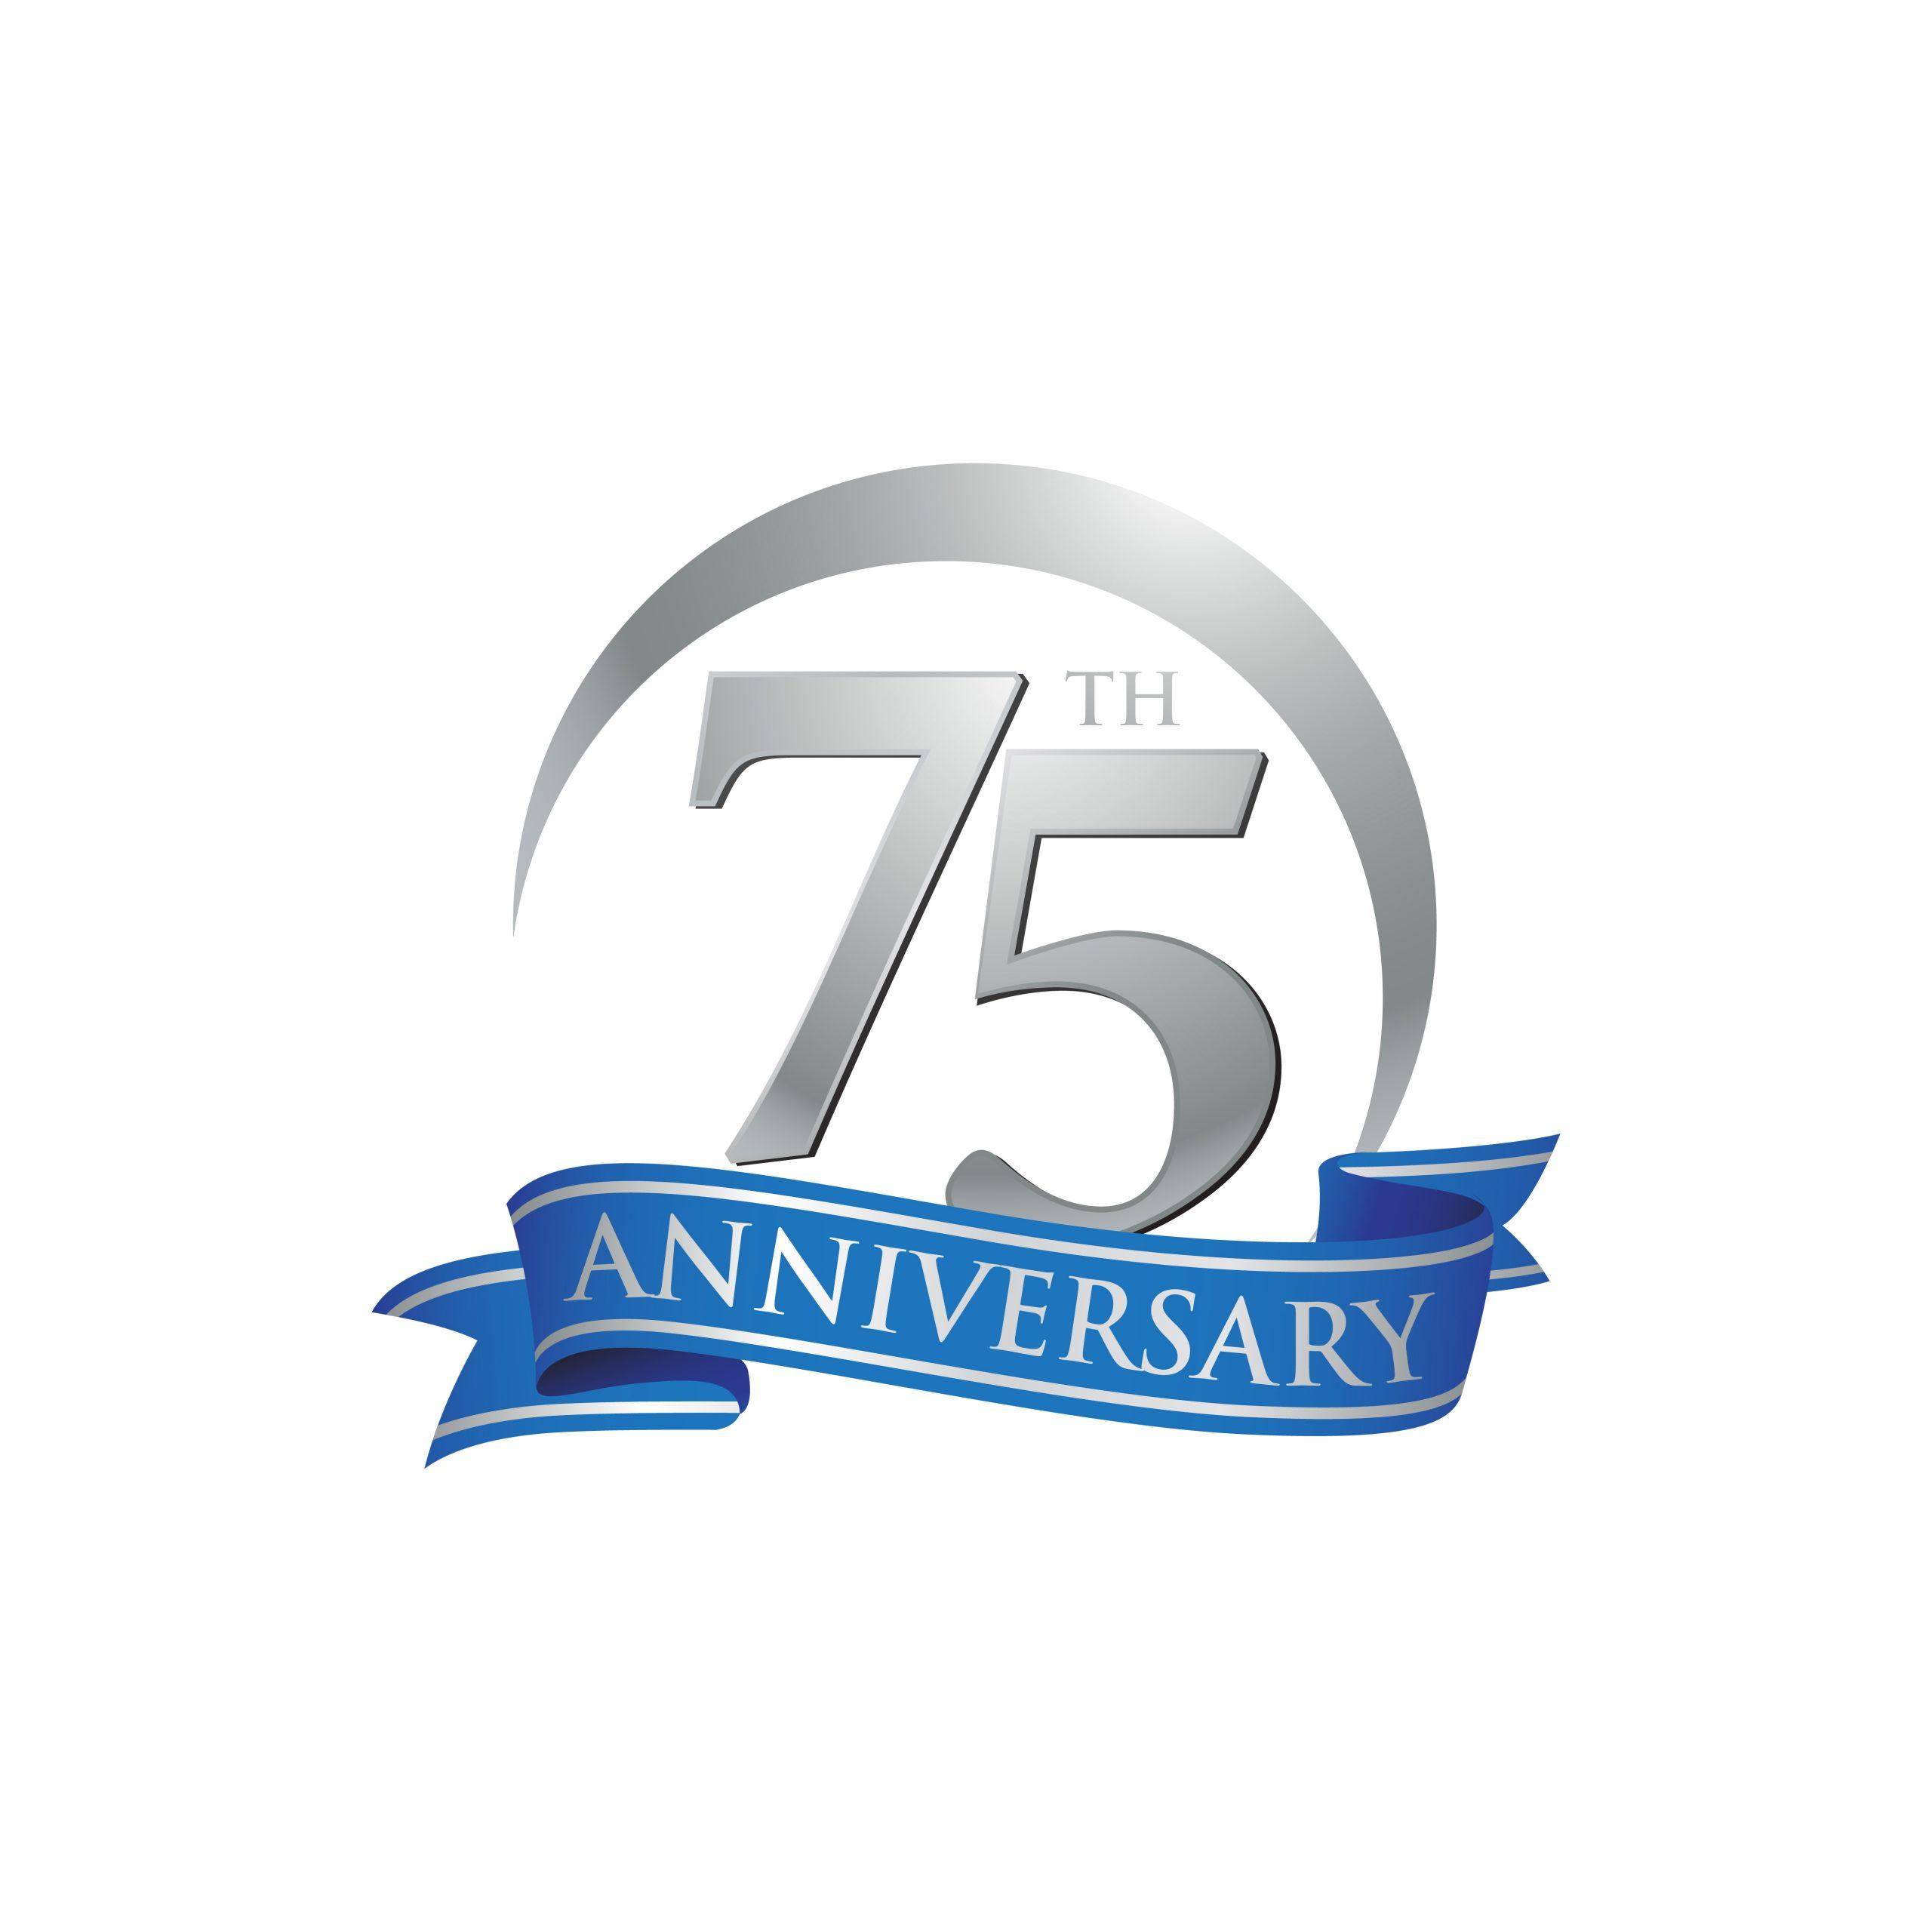 https://depositphotos.com/86344278/stock-illustration-75th-anniversary-ring-logo-blue.html